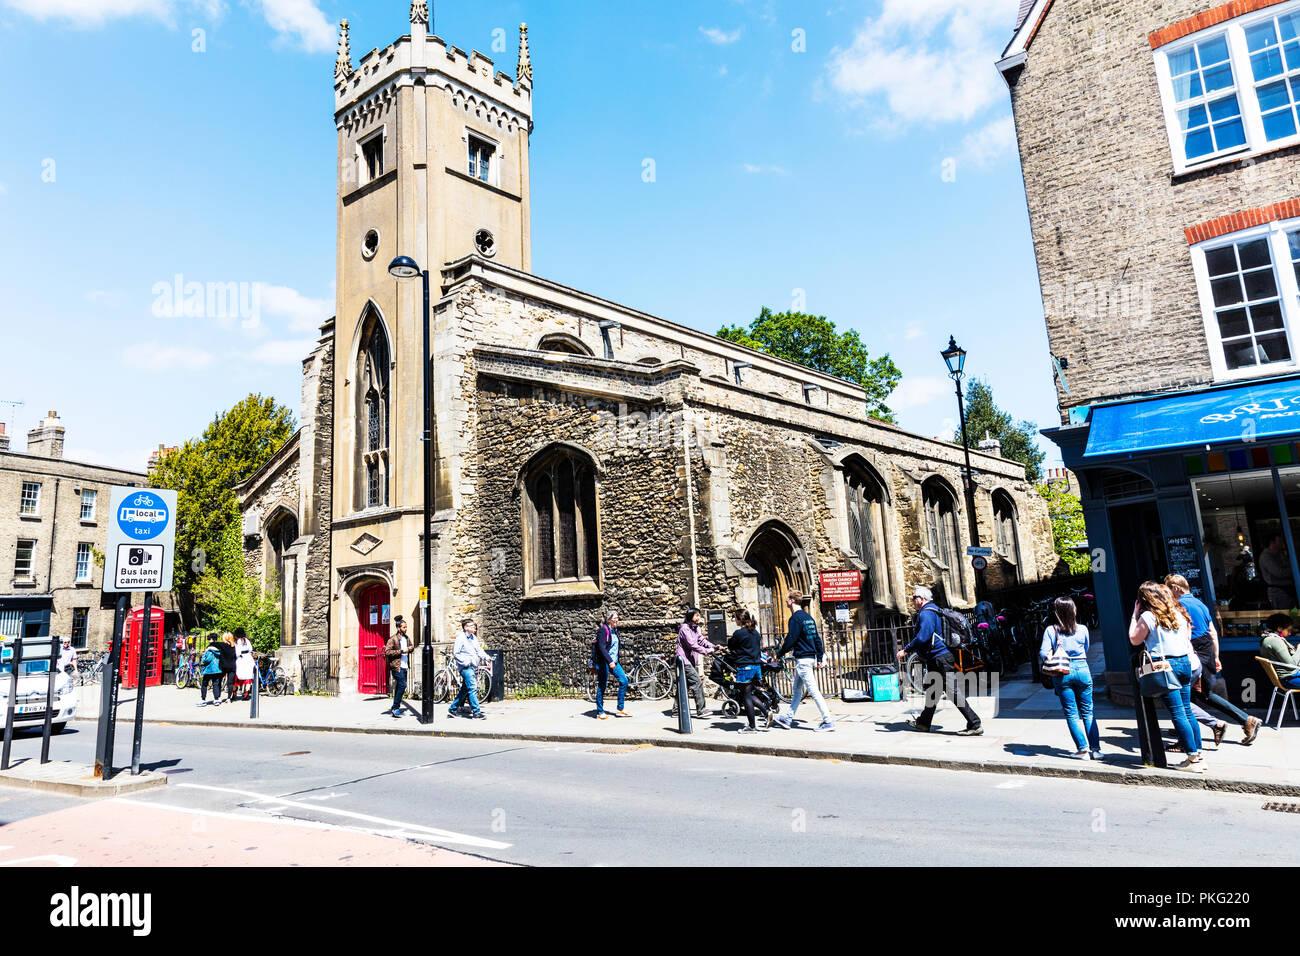 parish church of st clement cambridge, Church of England, St Clement's Church, Cambridge, churches, UK, front, facade, building, exterior, street view - Stock Image